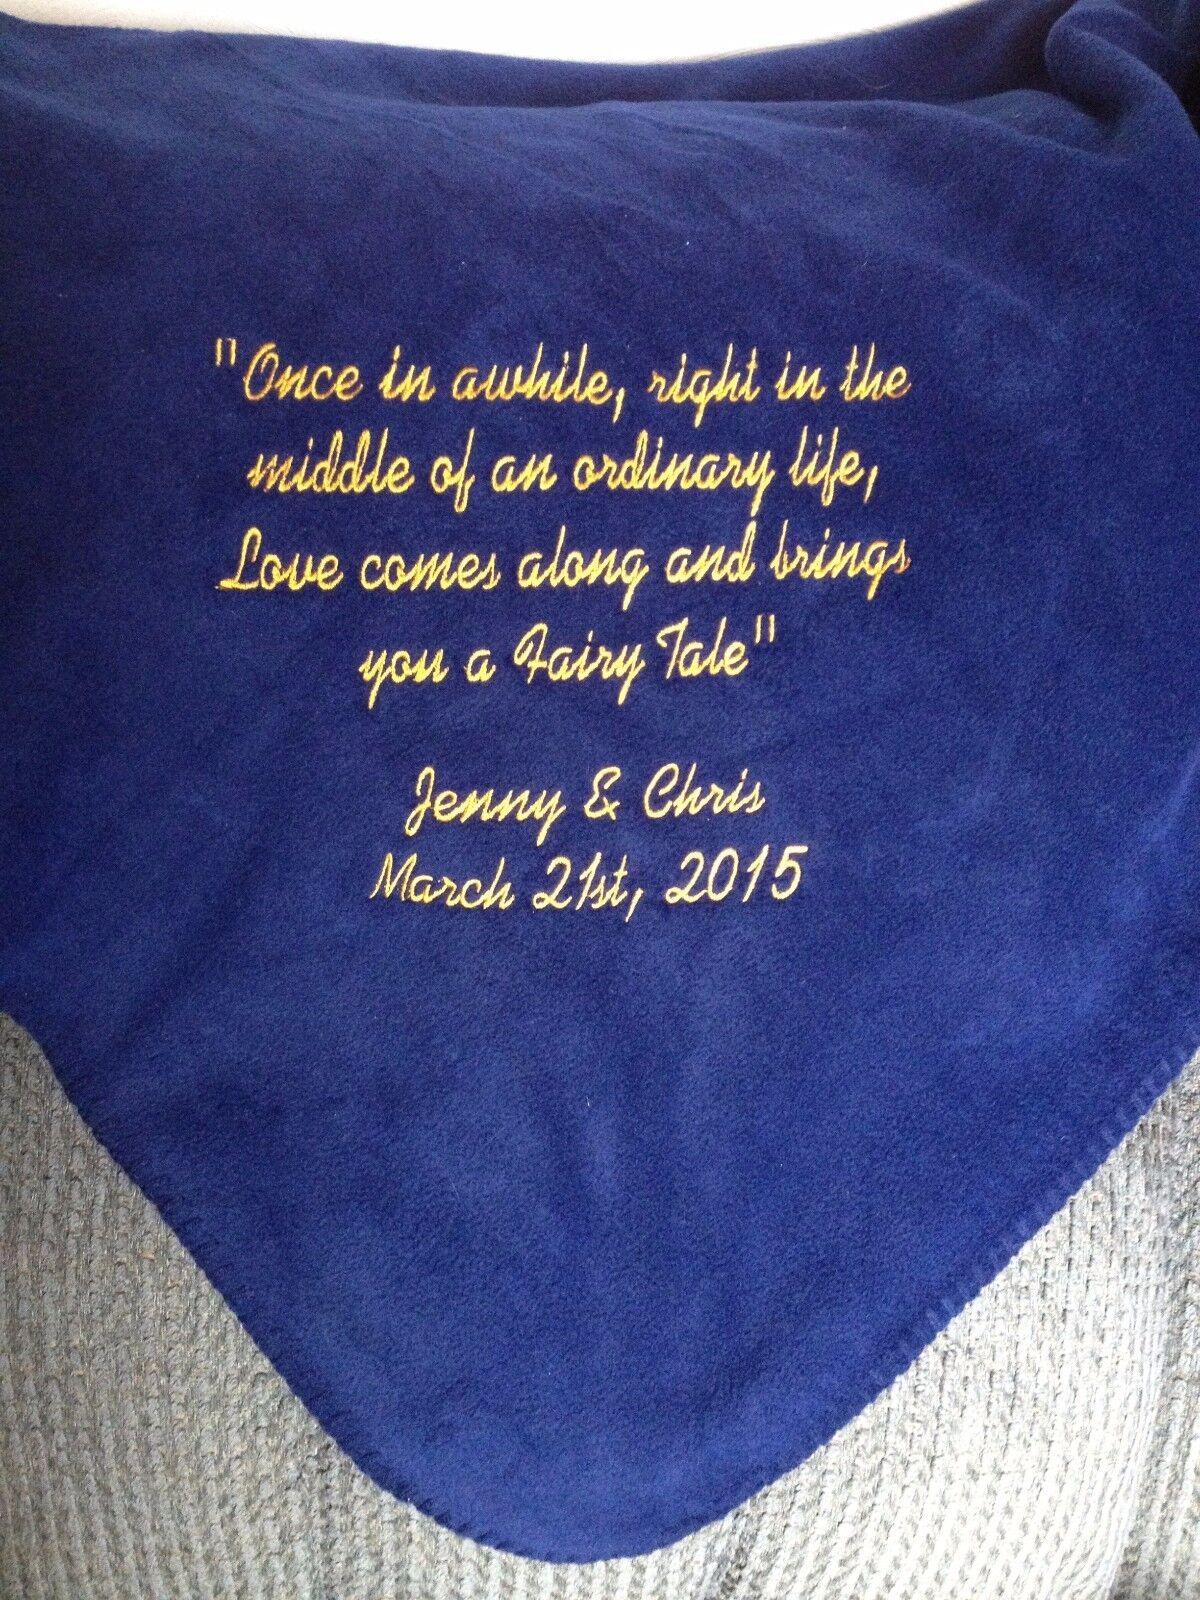 Personalized Bride Groom Wedding Gift Bridal Shower Fleece Throw Blanket